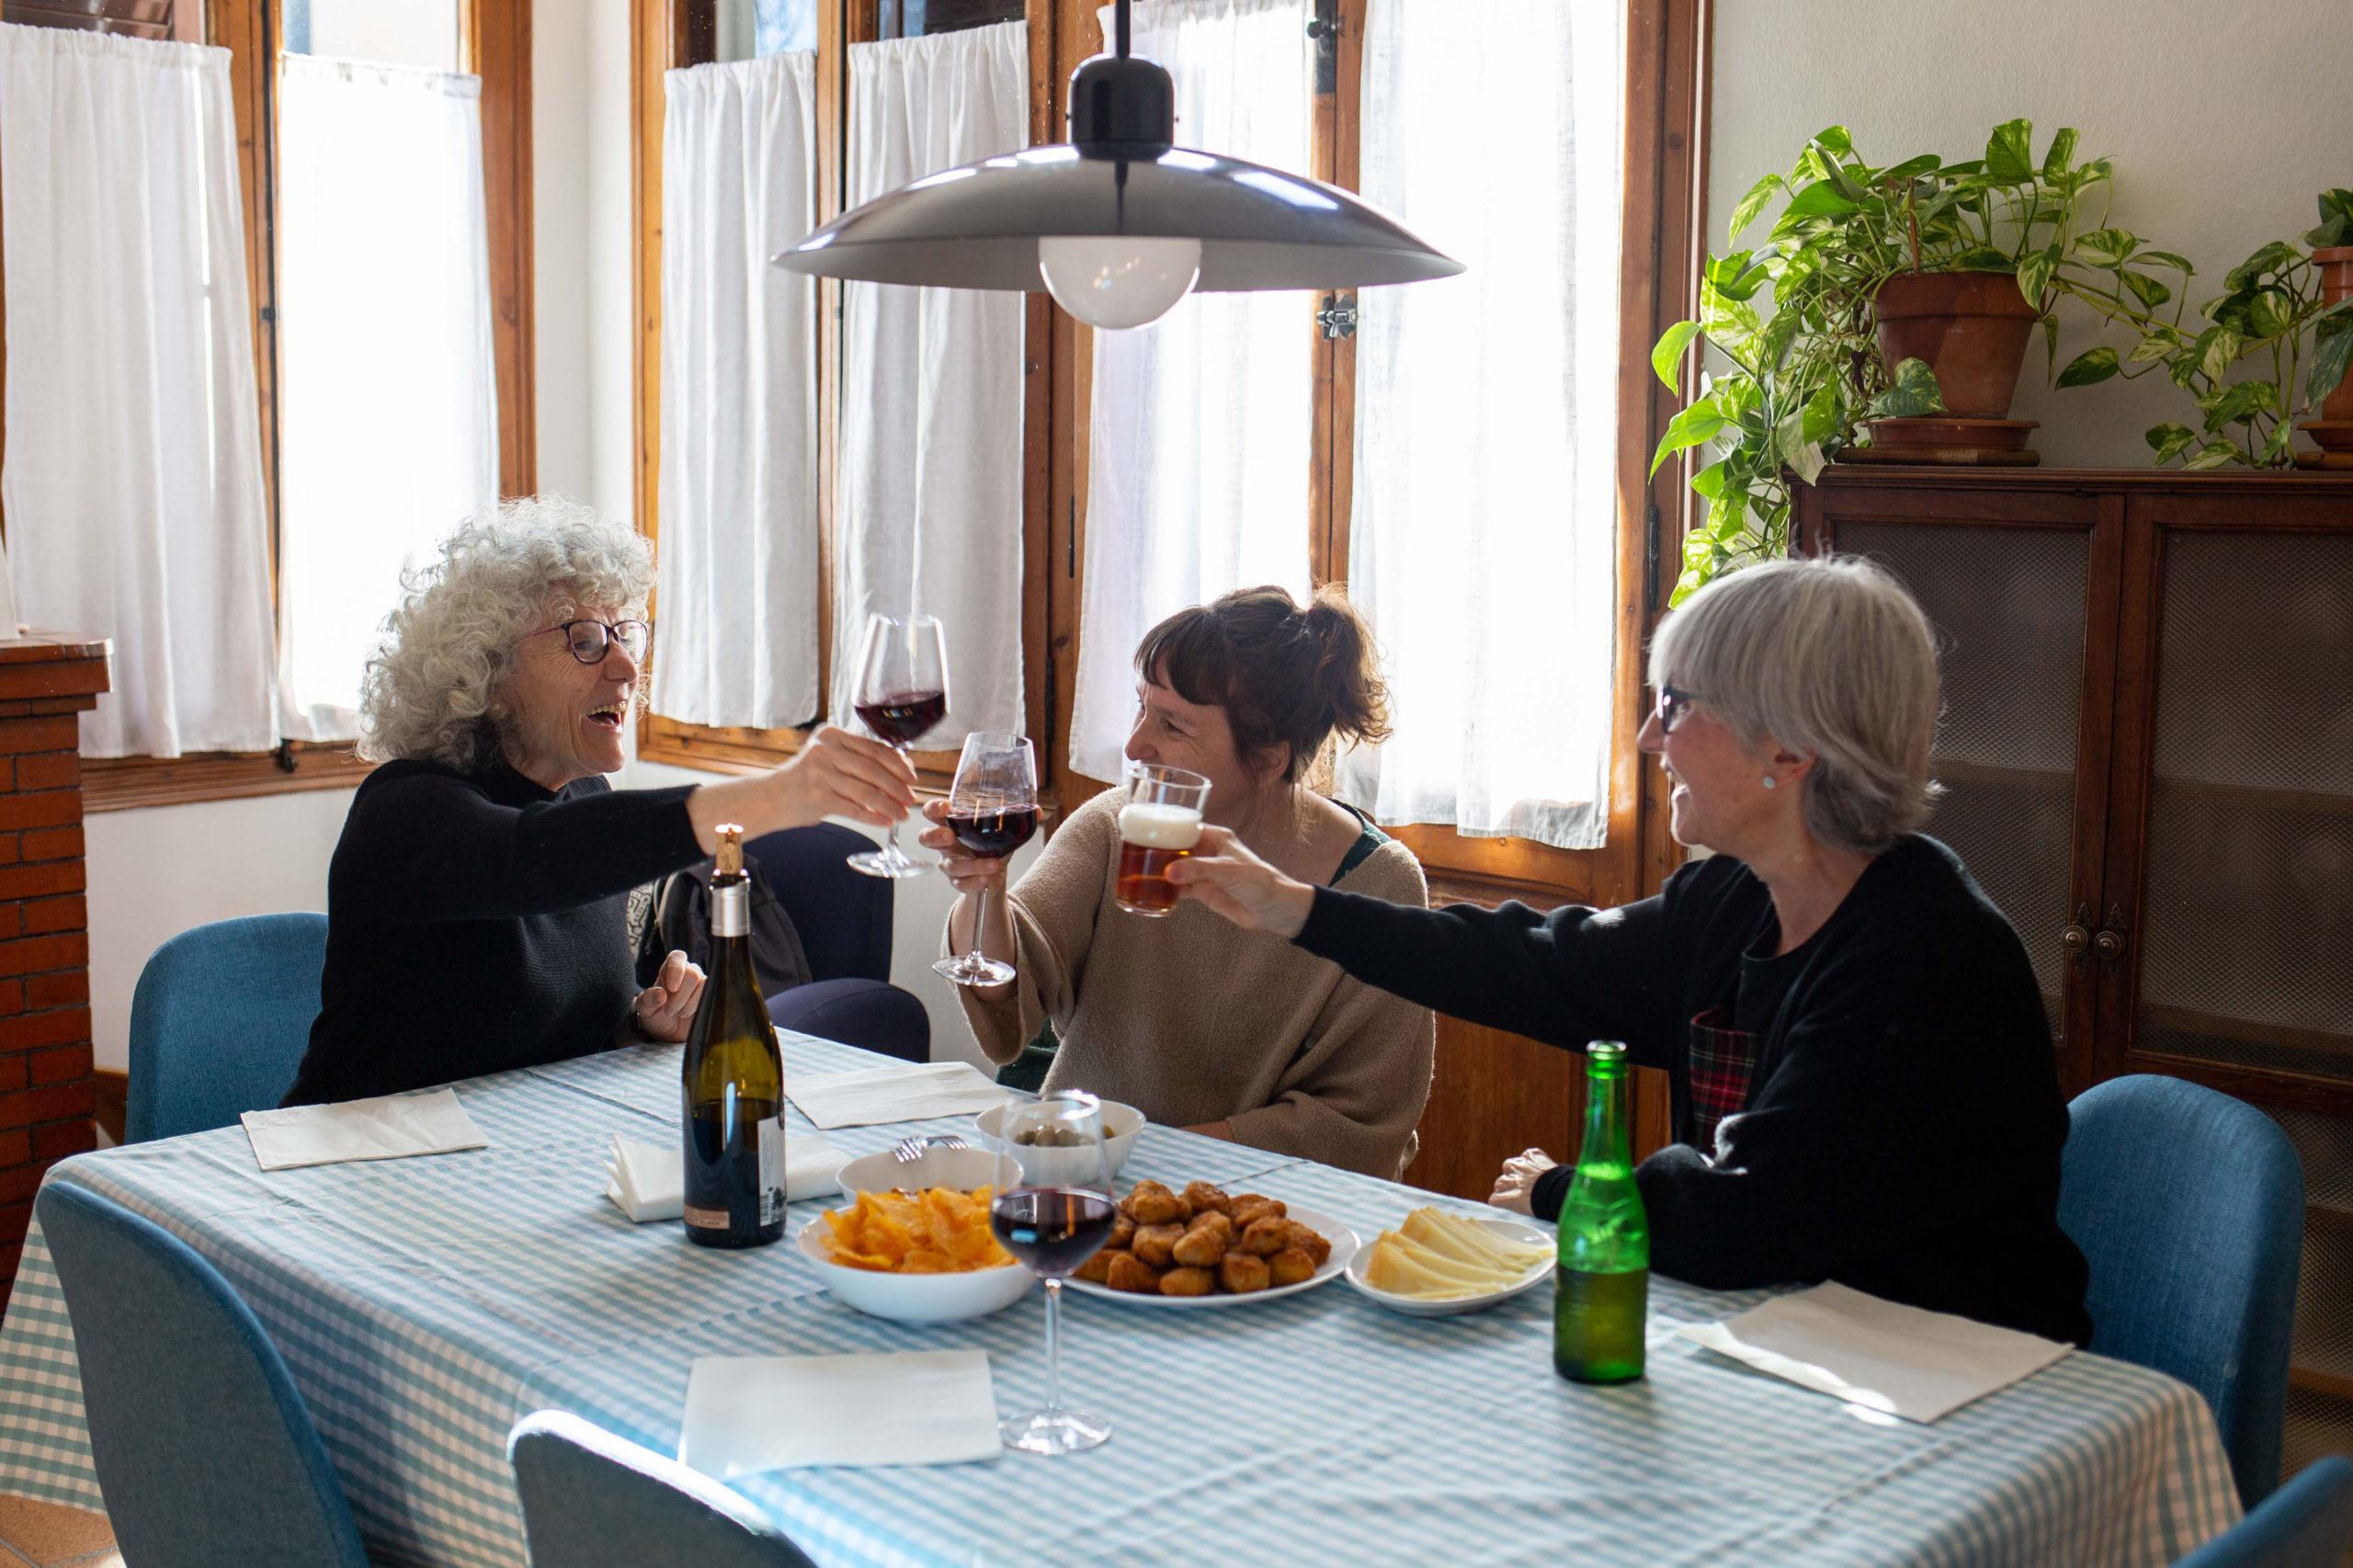 Tres amigues brindant en un dinar al menjador de casa